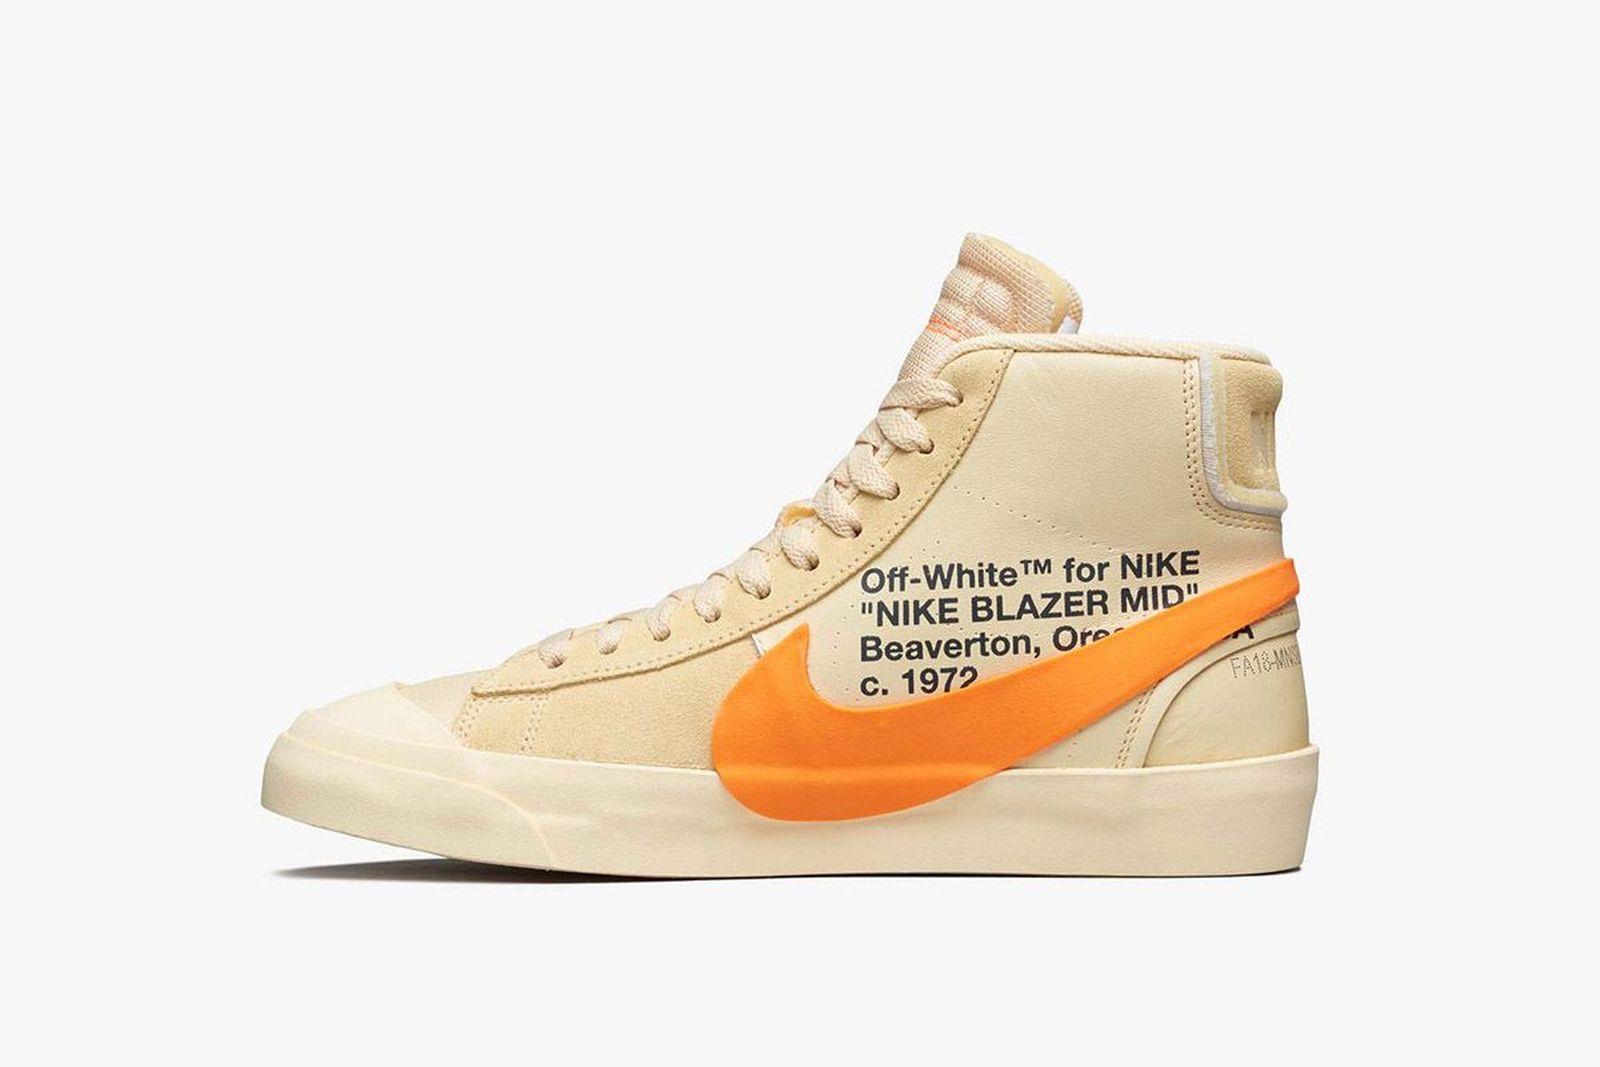 http whatdropsnow.s3.amazonaws.comproduct imagesimages137799157e2199812585a2e932d33ac313da63b0cc8a2e GOAT Nike The Ten OFF-WHITE c/o Virgil Abloh